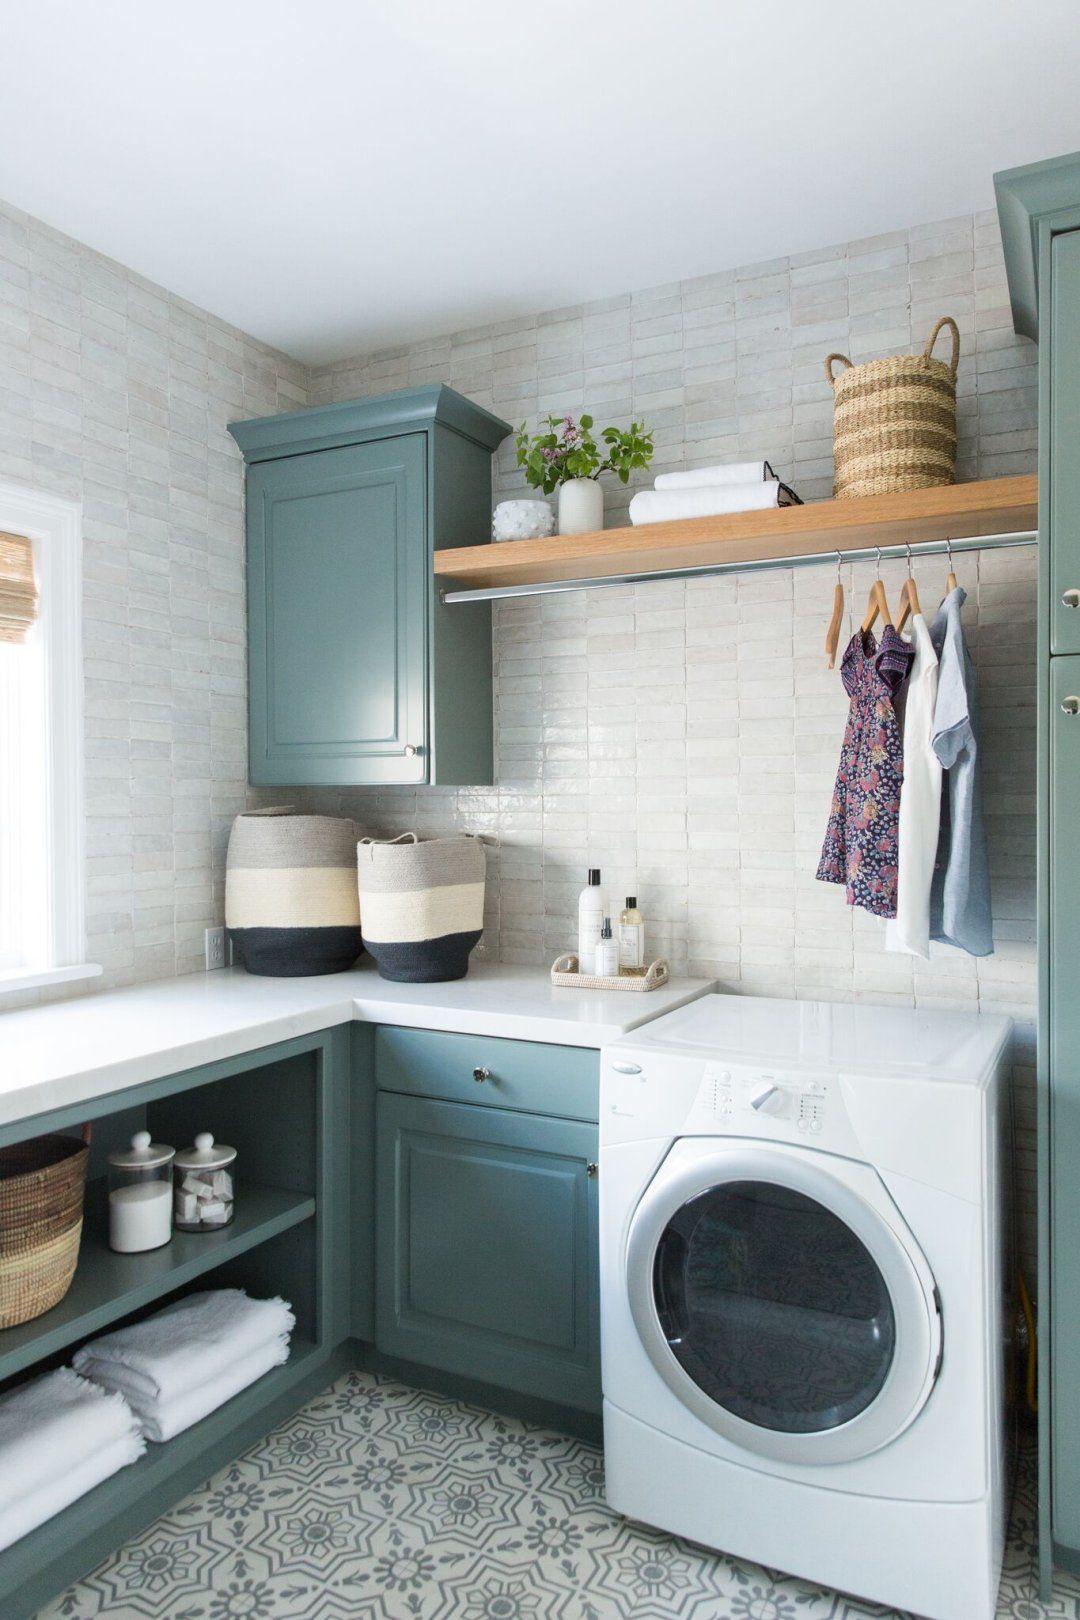 Design Laundry Room Online: Stony Brook Laundry Room Transformation